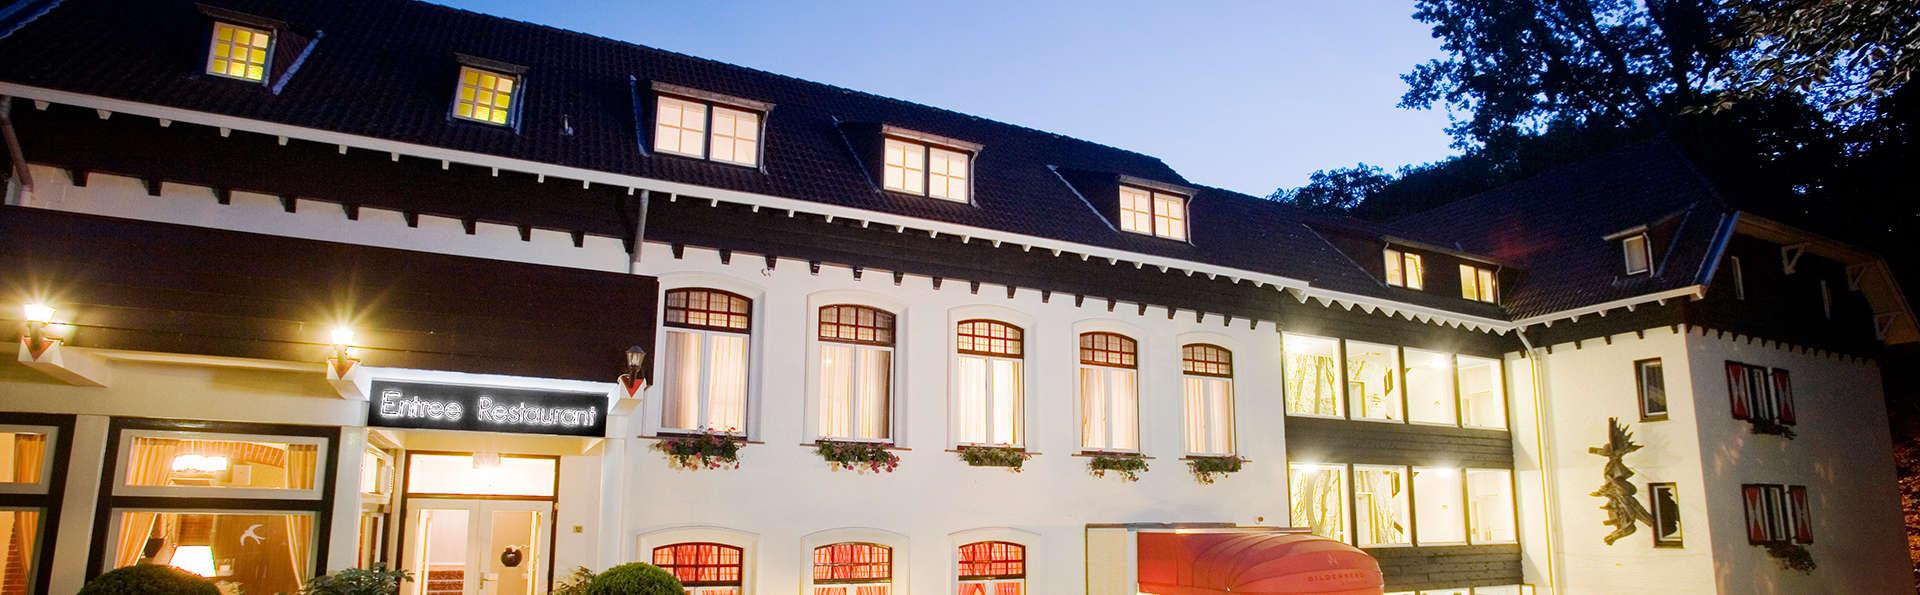 Bilderberg Hotel De Bovenste Molen - EDIT_front1.jpg